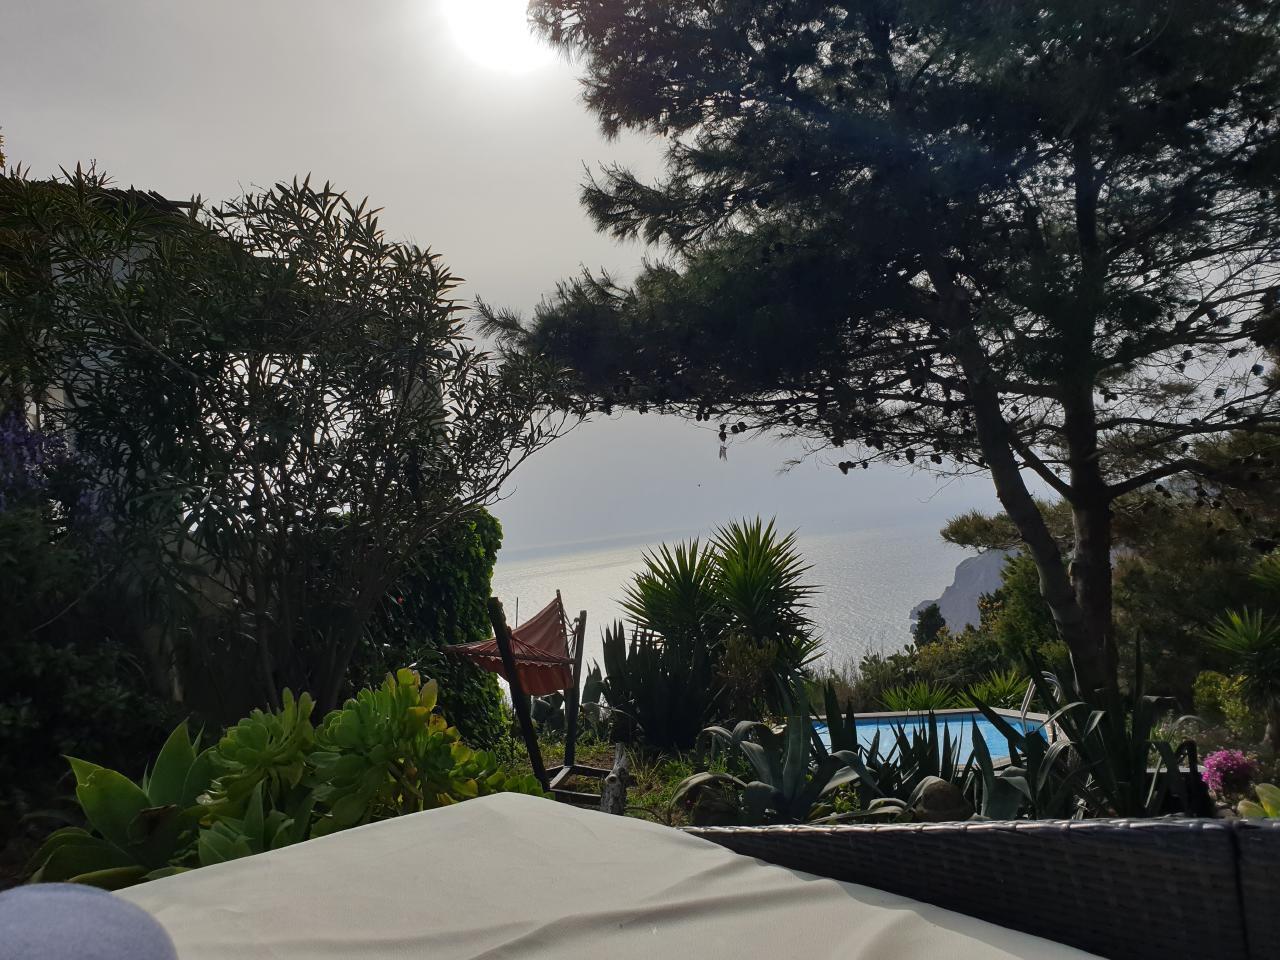 Maison de vacances Casetta Eoliana Lipari Inseln, pool, sauna. (827872), Lipari, Lipari, Sicile, Italie, image 31